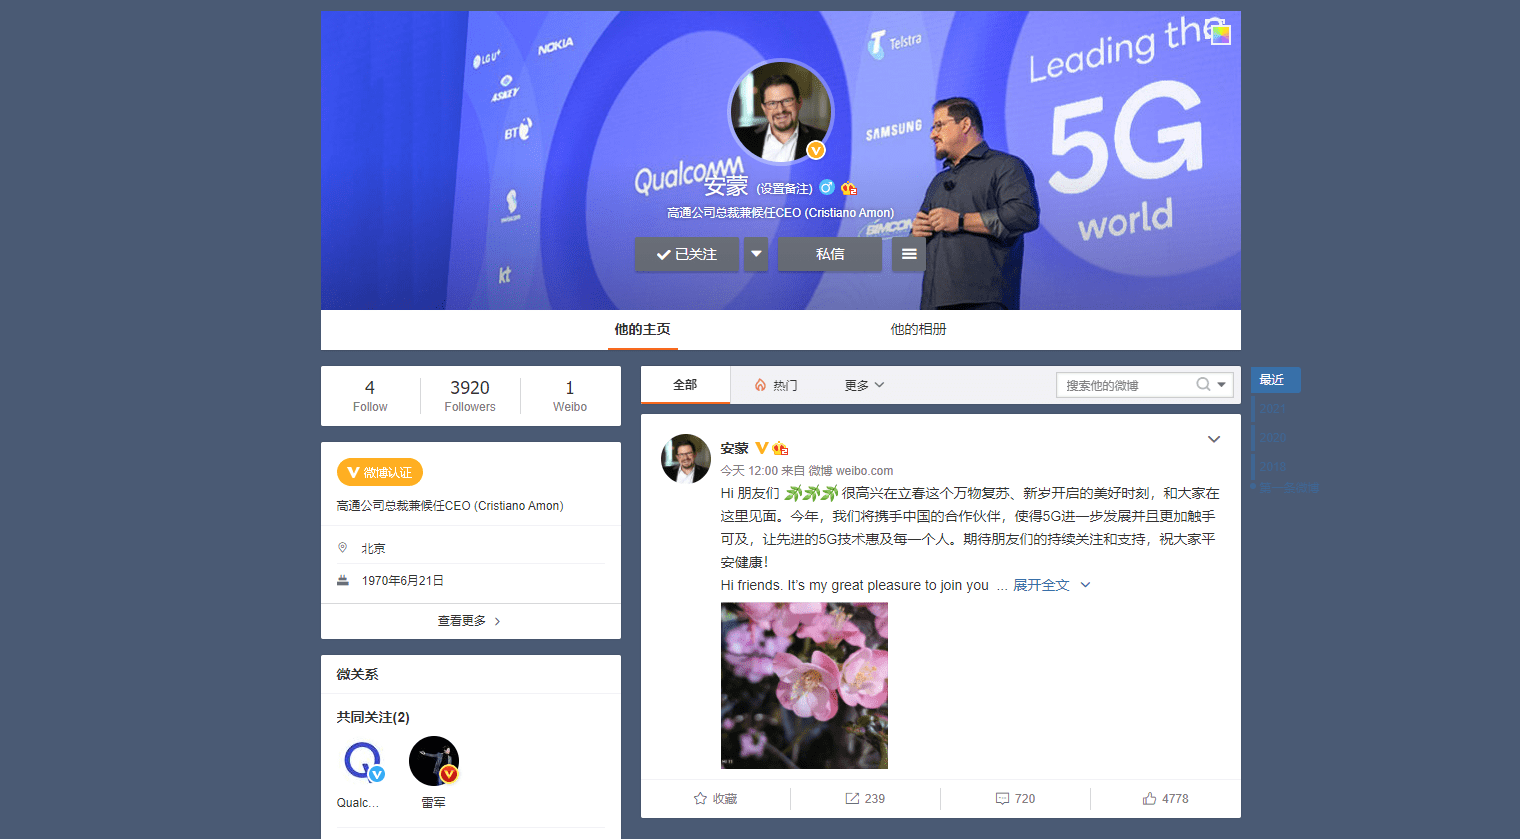 Qualcomm次期CEOのアモン氏、Weiboに公式アカウントを作成